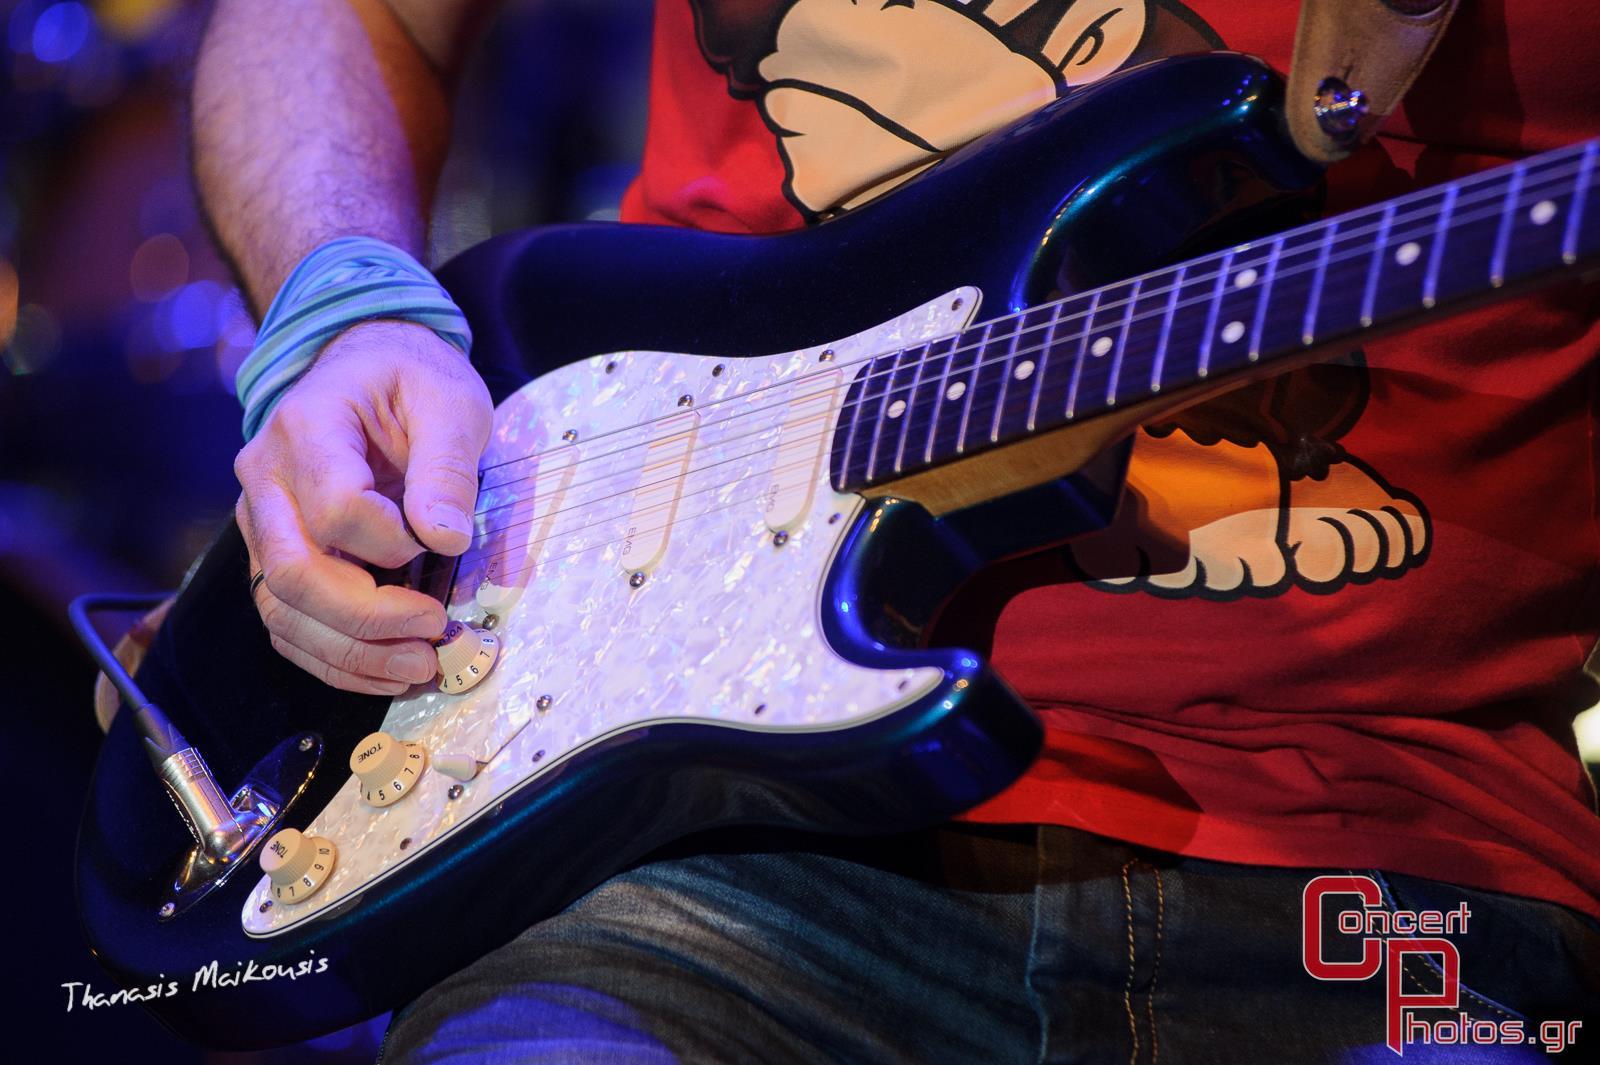 Locomondo- photographer:  - ConcertPhotos-3420